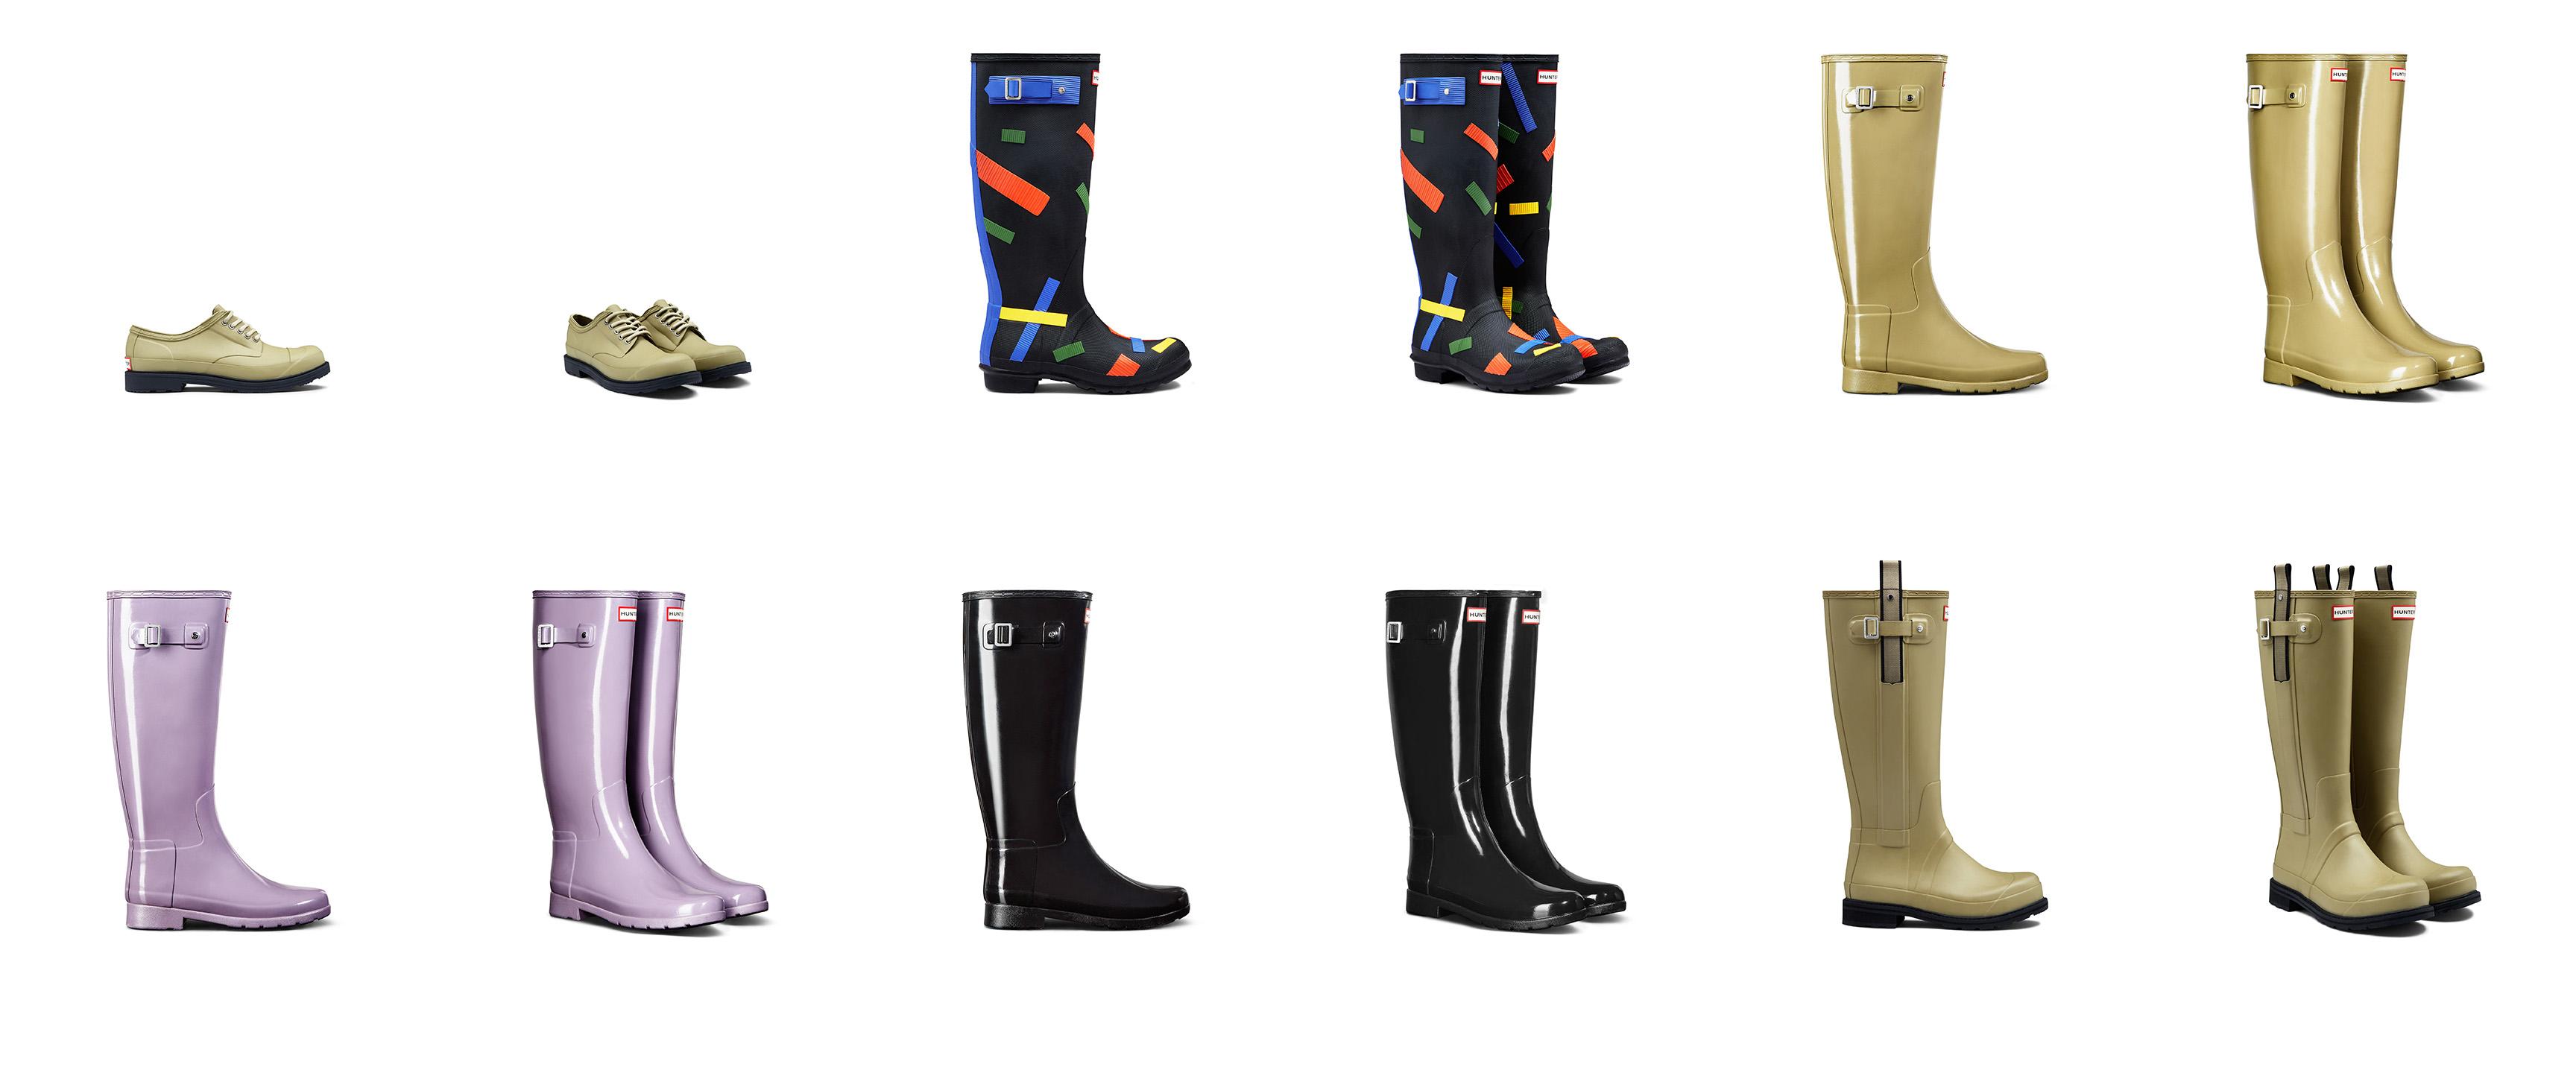 comma, Sapatarias : Sapatos Botas Acessórios